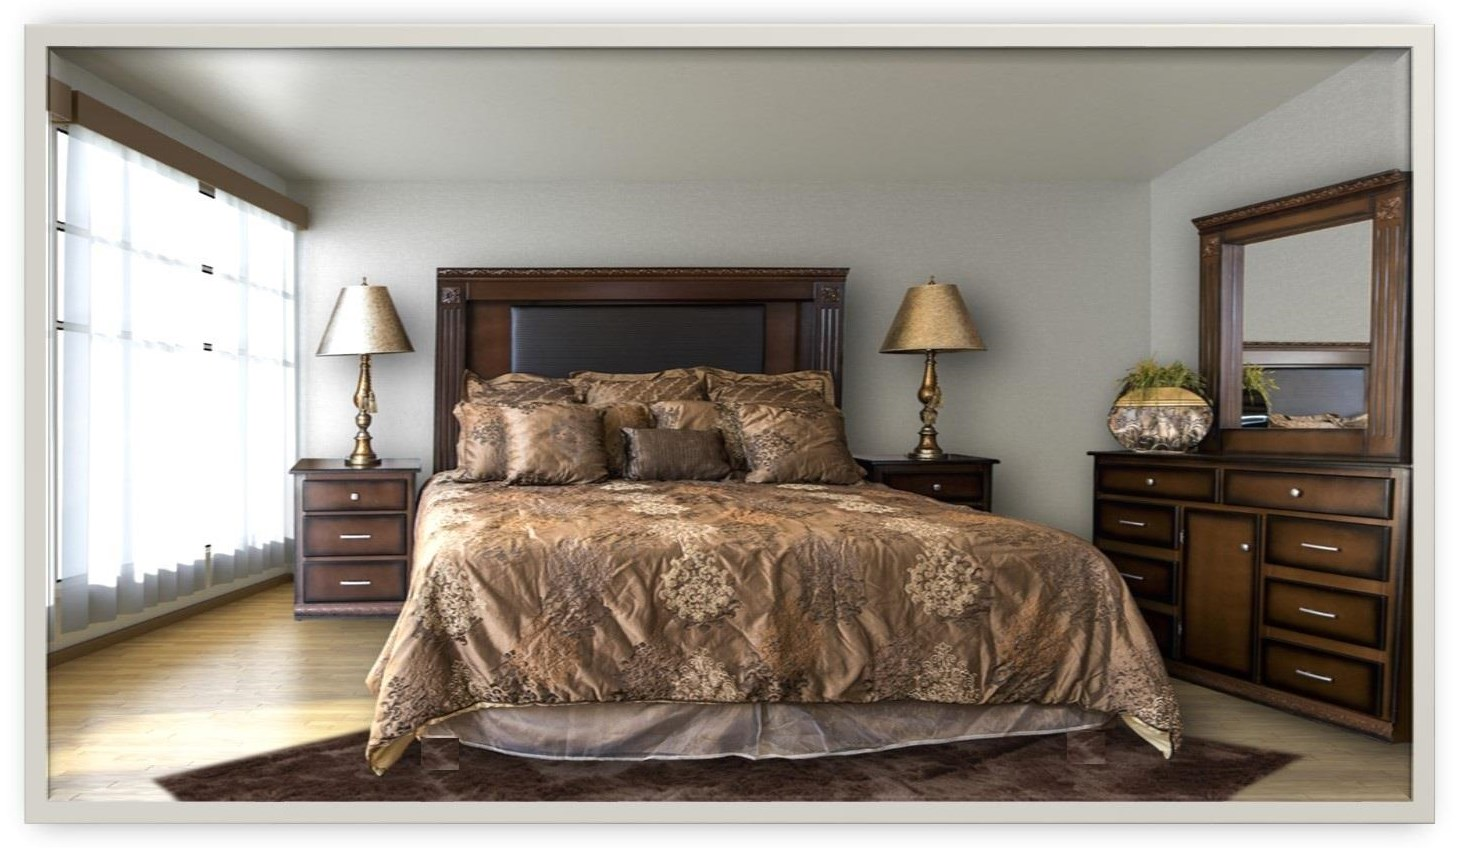 MALAGA MALAGA 5pc Bedroom Group by Phoenix Custom Furniture at Del Sol Furniture